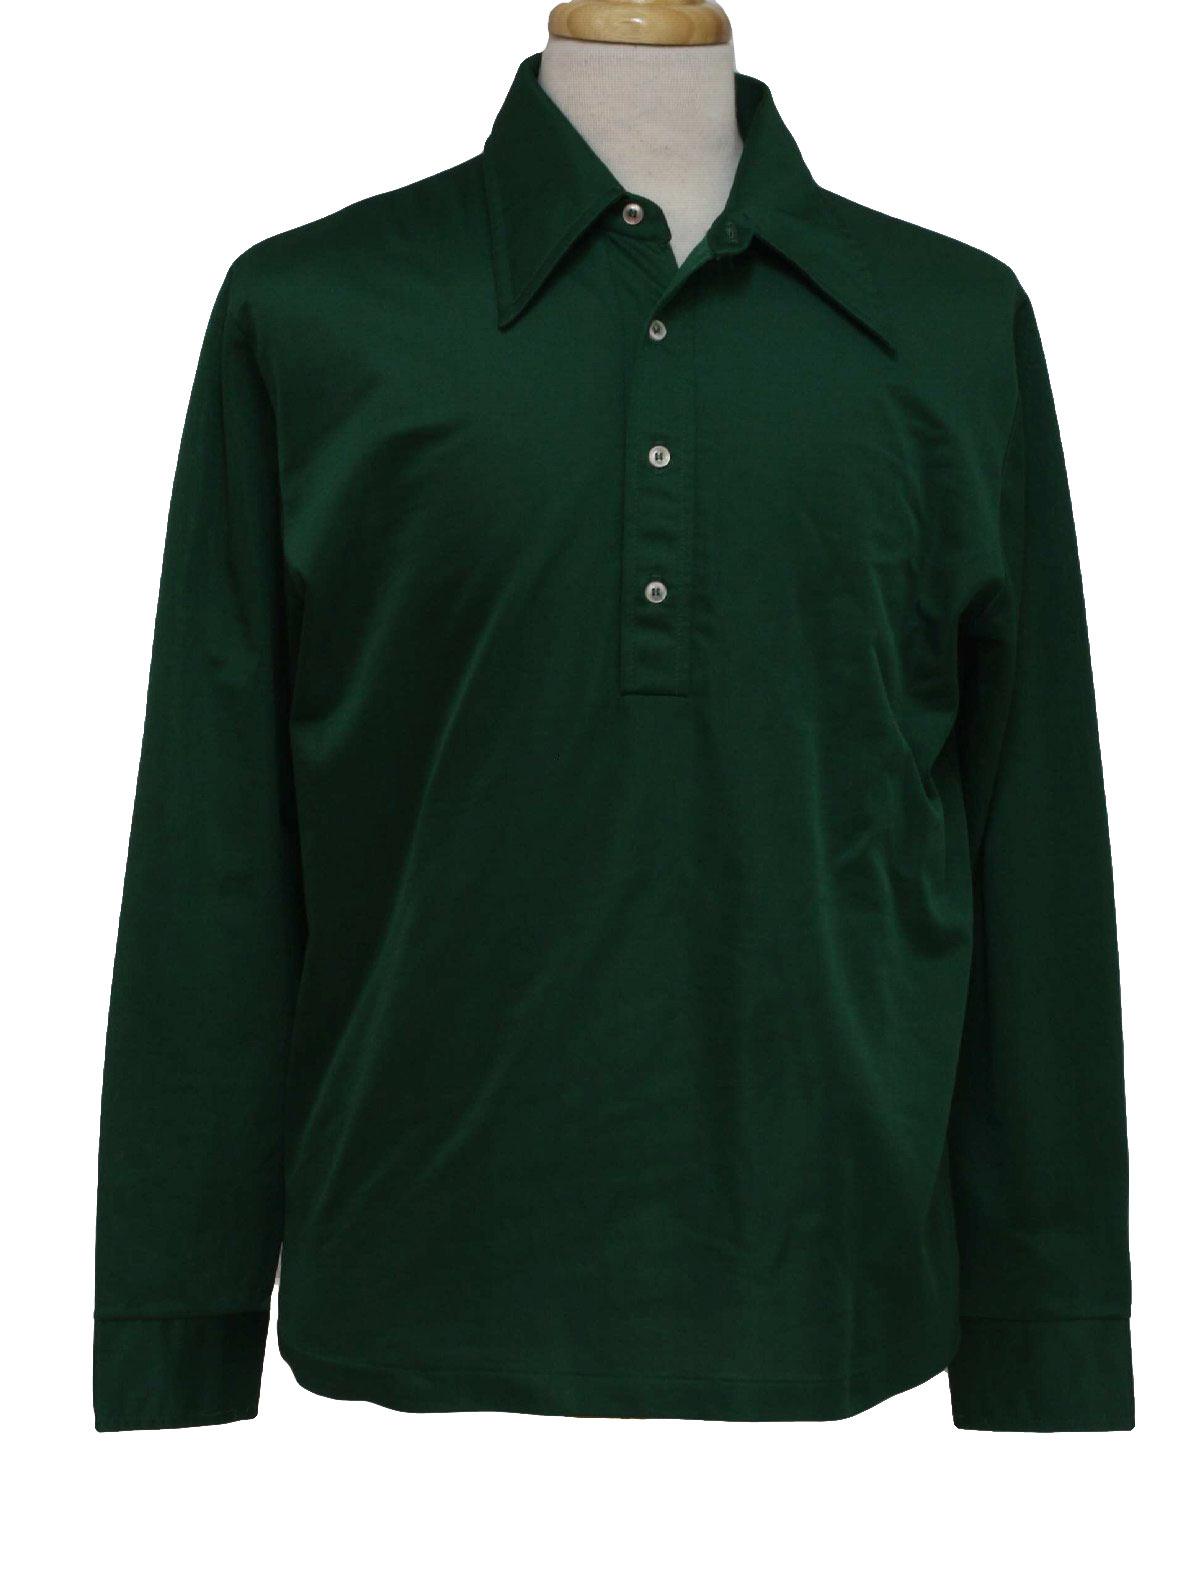 1970s Edgeworth Shirt 70s Edgeworth Mens Emerald Green Slinky